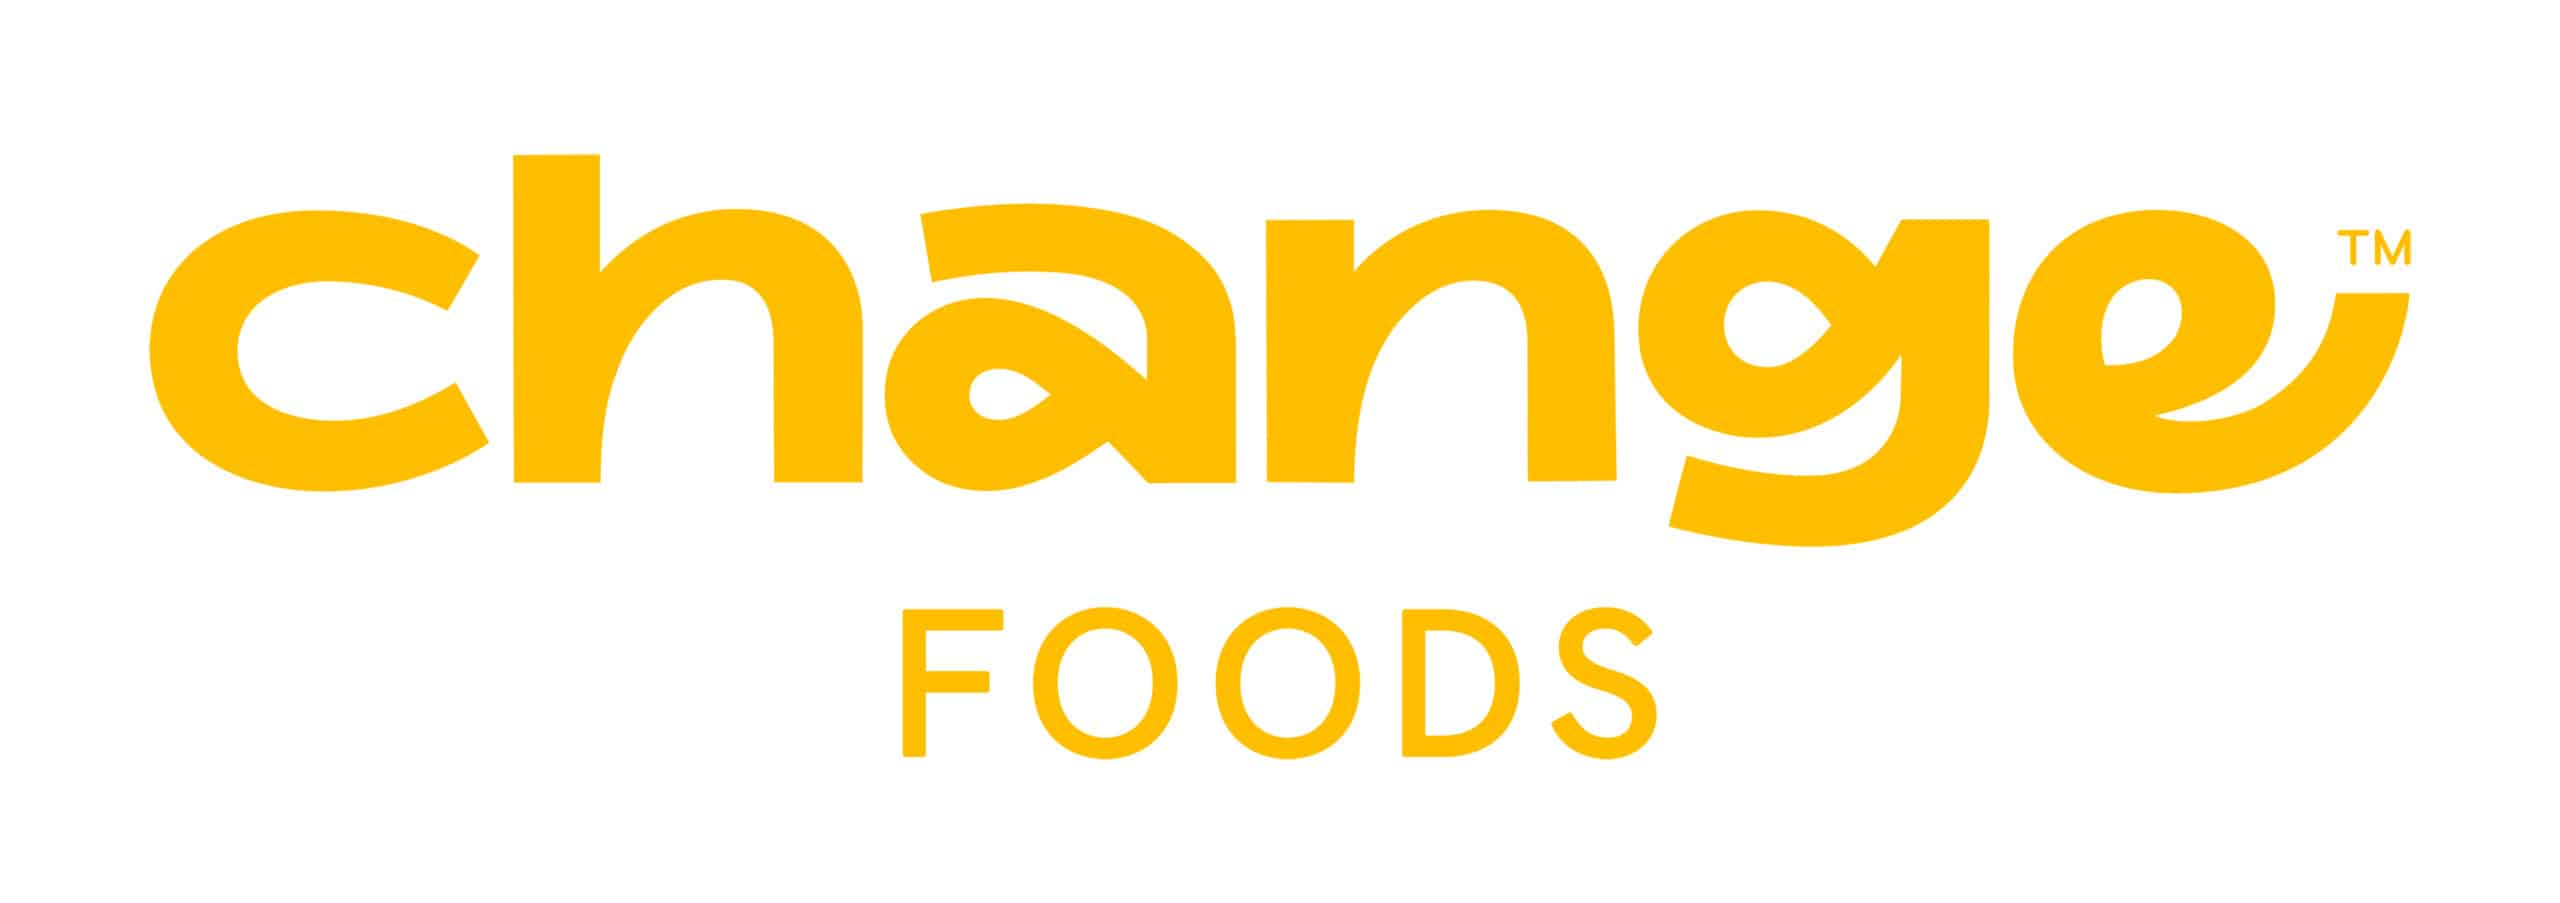 Change-Foods-Logo-RGB-01-Yellow